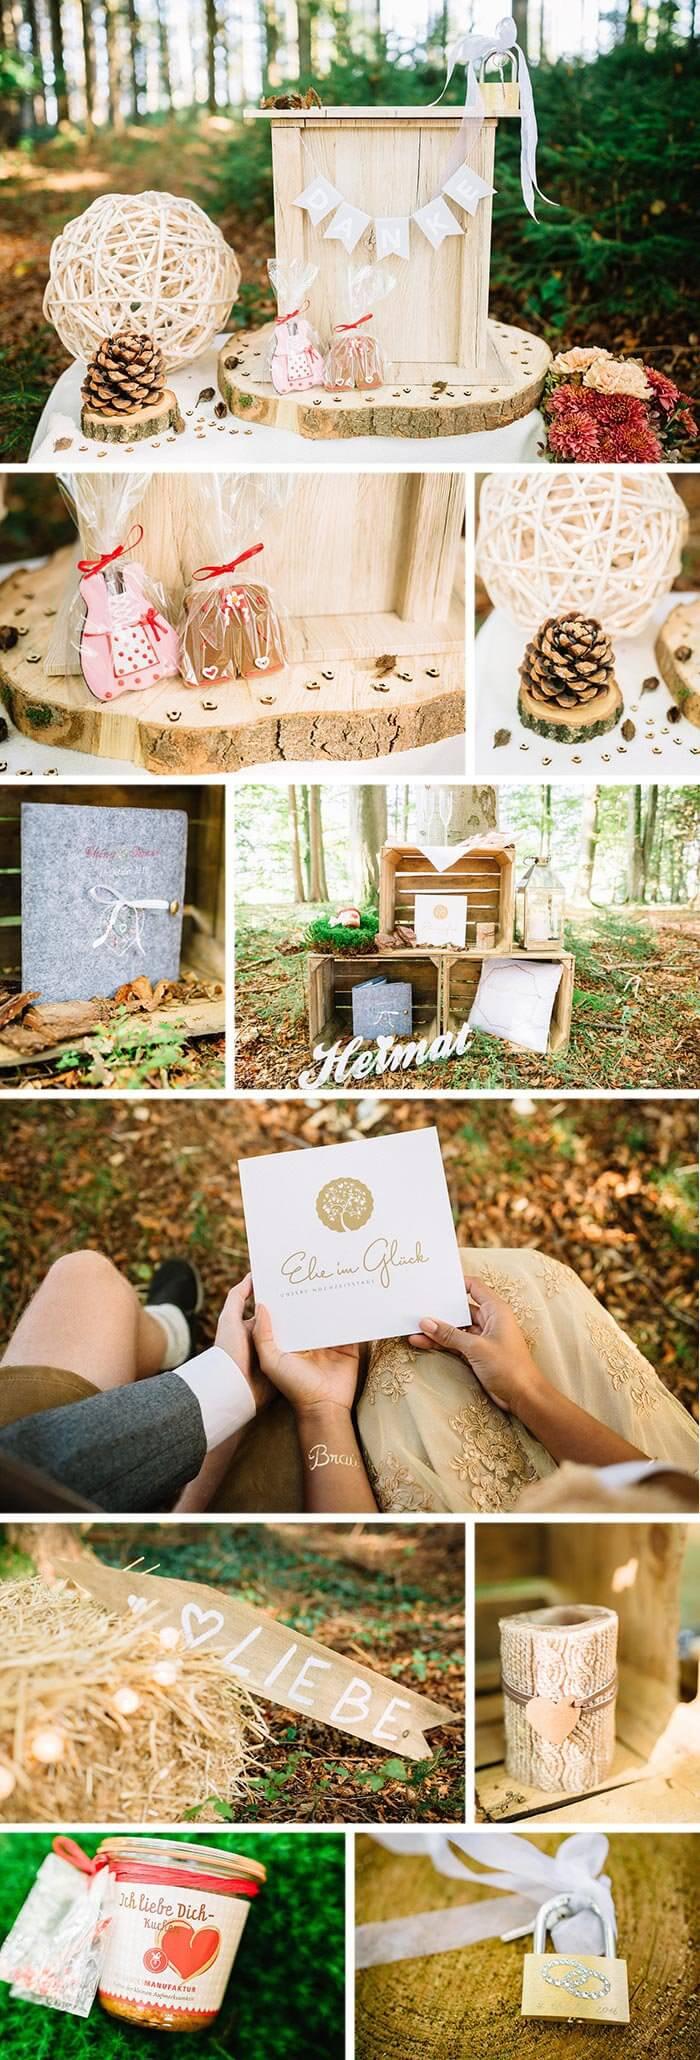 Hochzeit Im Grunen Ideen Fur Eure Rustikale Naturhochzeit